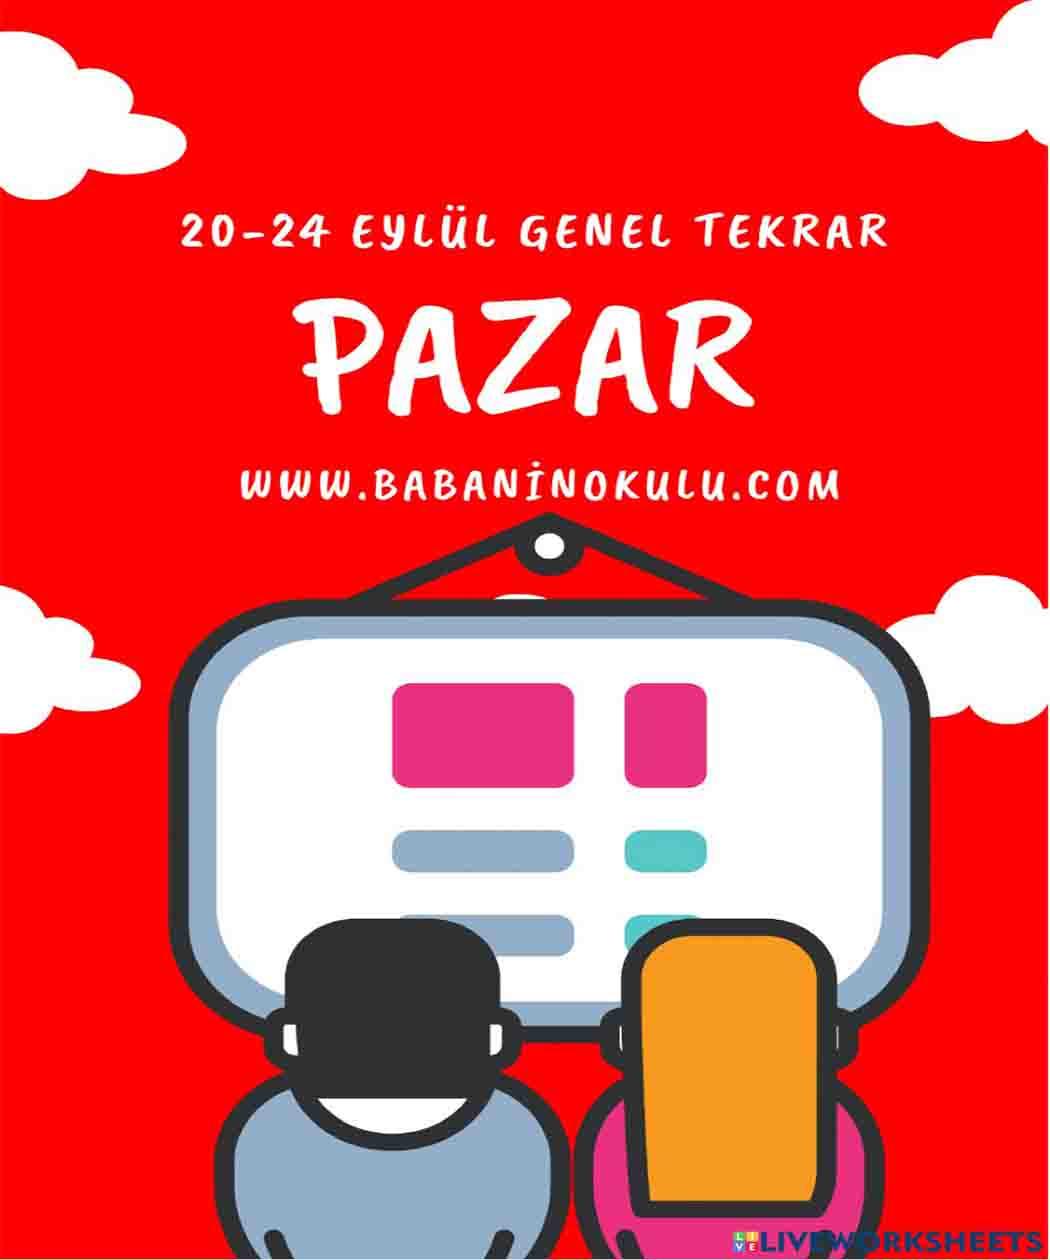 20-24 EYLÜL TEKRAR PAZAR